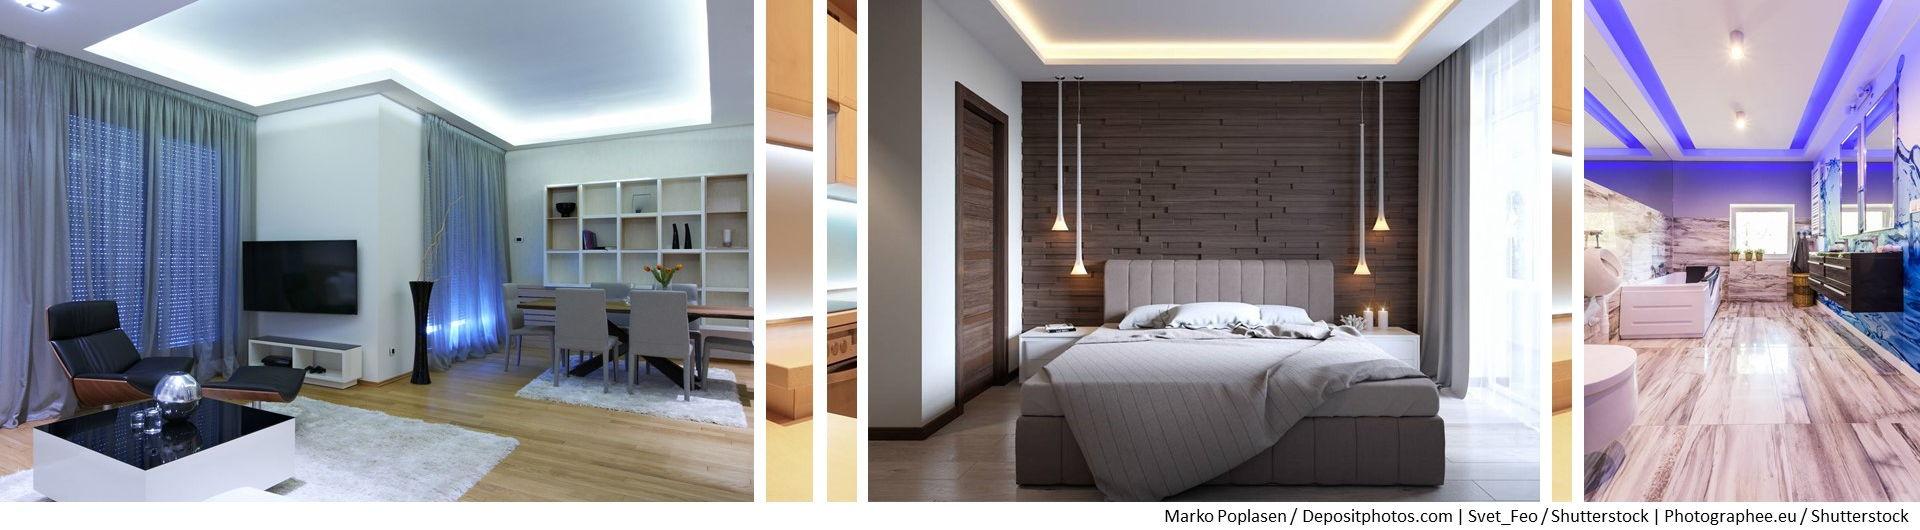 indirekte beleuchtung mit led selber bauen auswahl aufbau tips. Black Bedroom Furniture Sets. Home Design Ideas